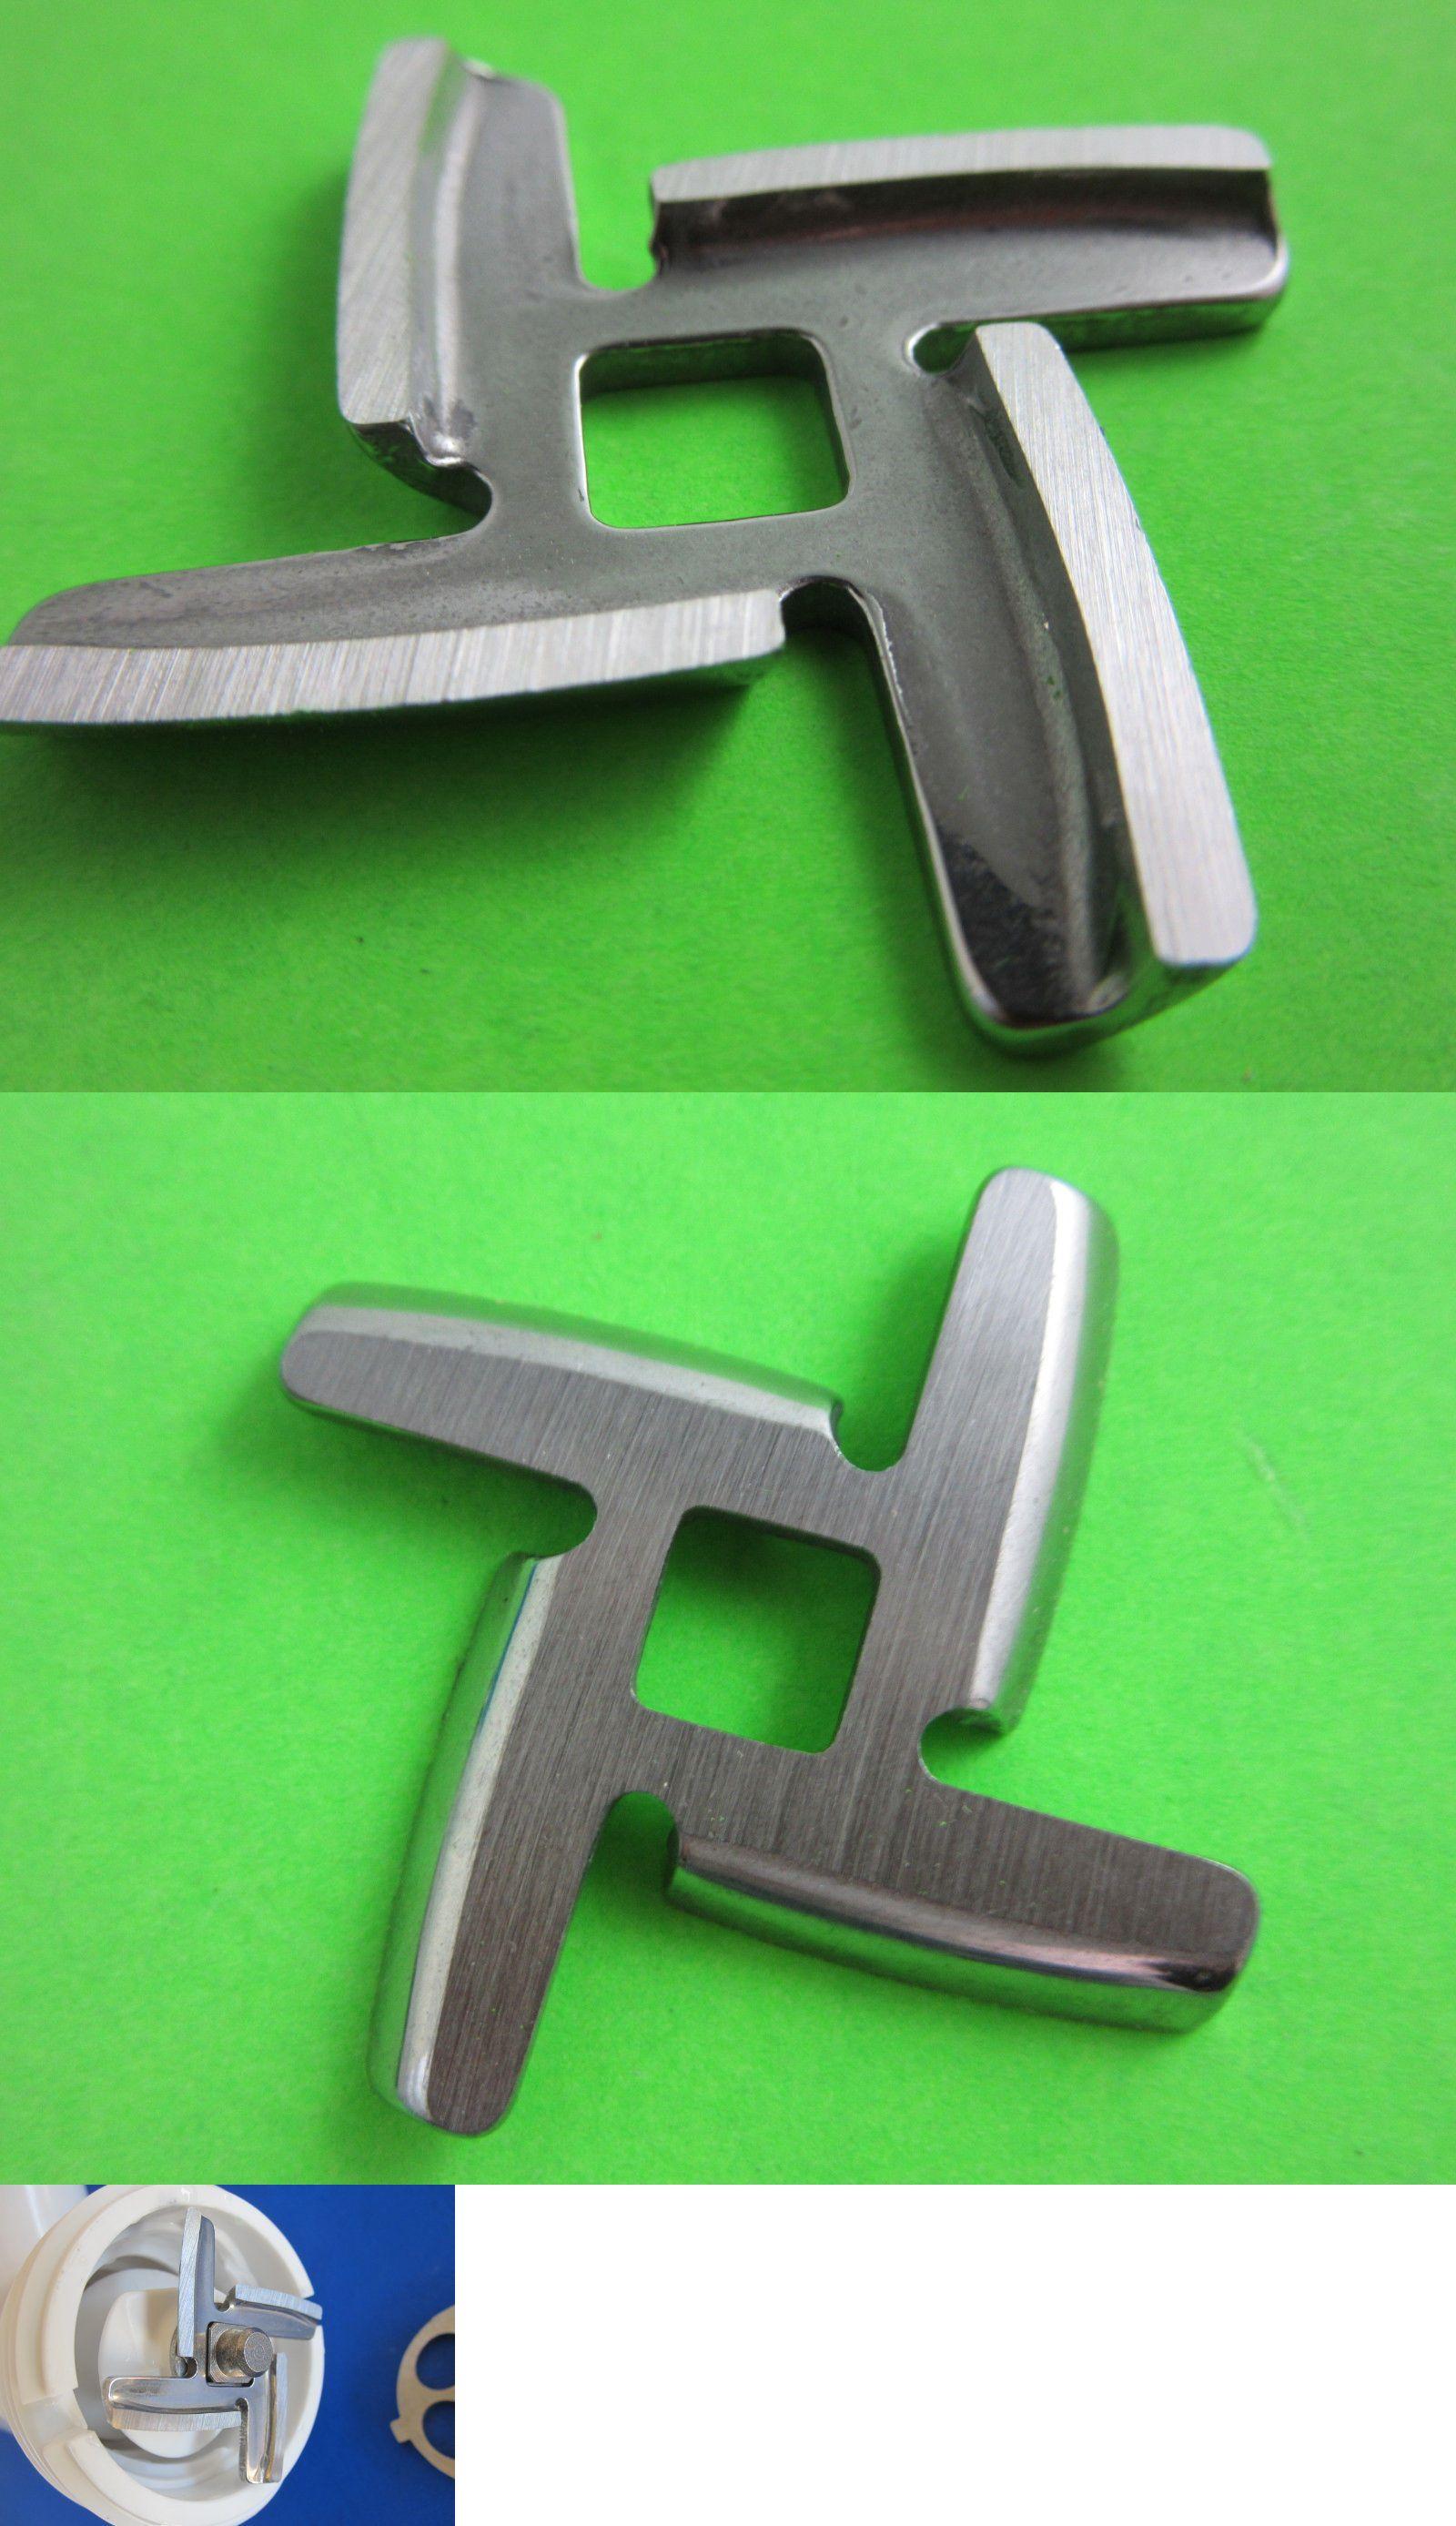 Kitchenaid FGA Food Grinder Mincer Fine Cutting Plate With A Cutter Blade.